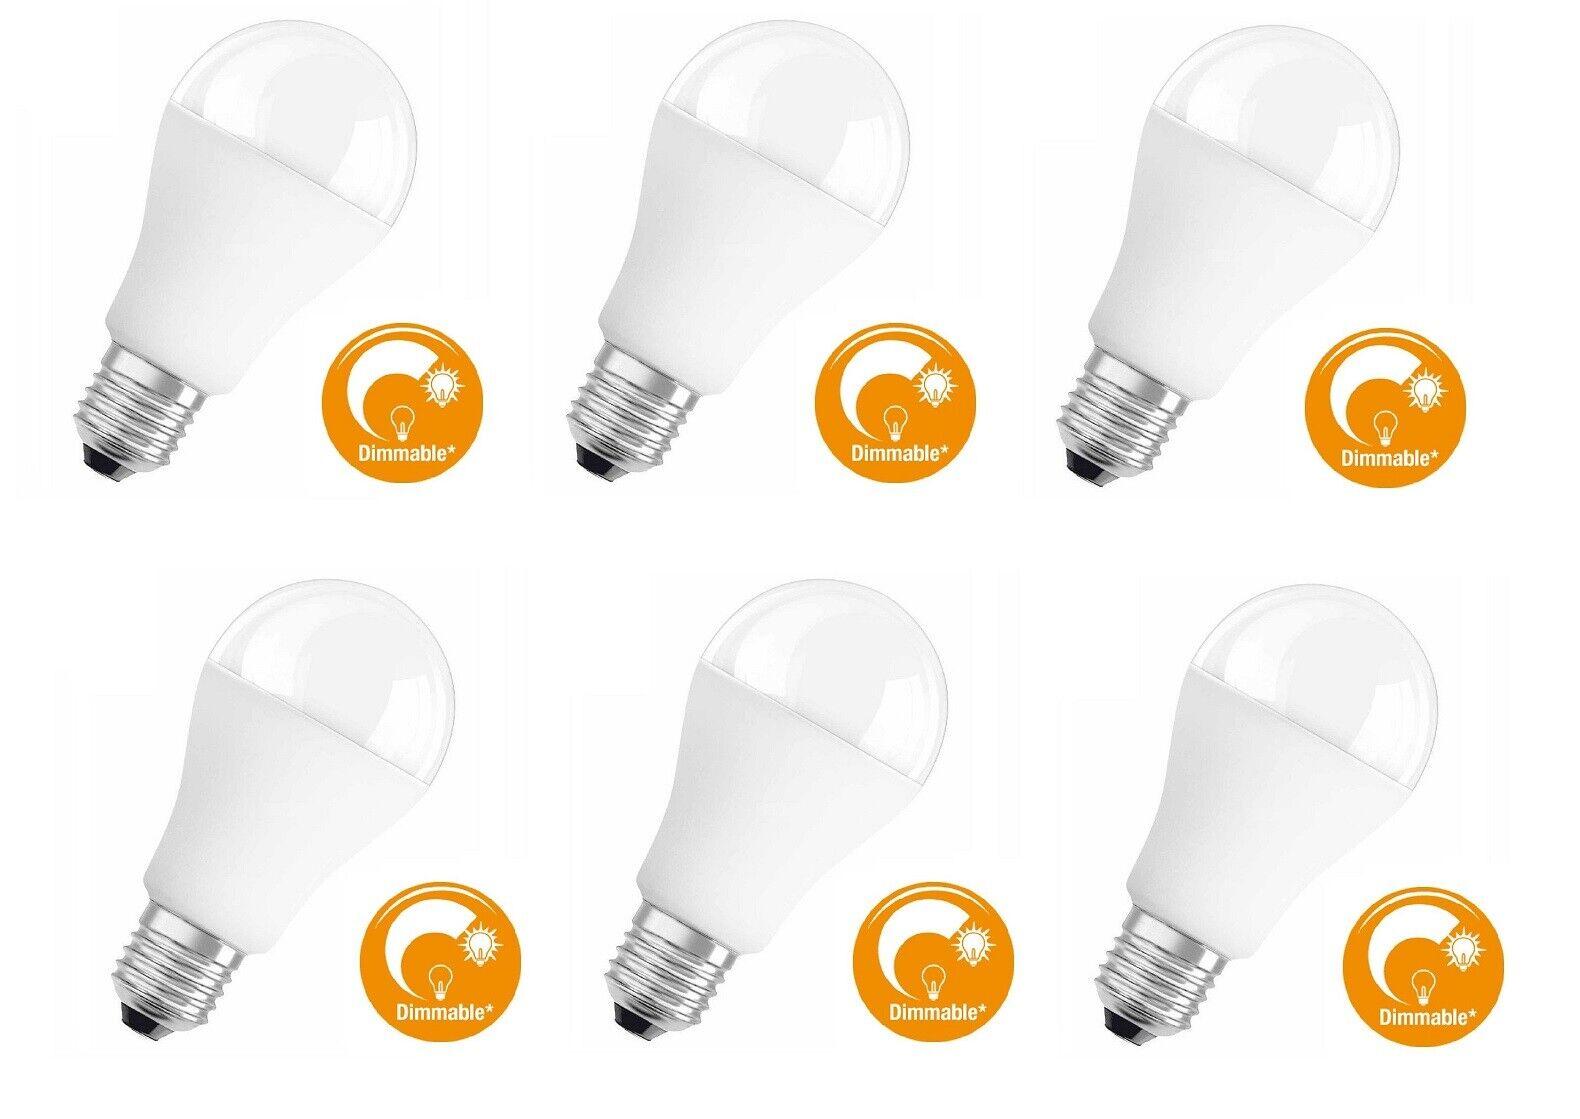 6x OSRAM LED Glühlampe    E27    dimmbar    15W = 100W    kaltweiß  4000K     A+